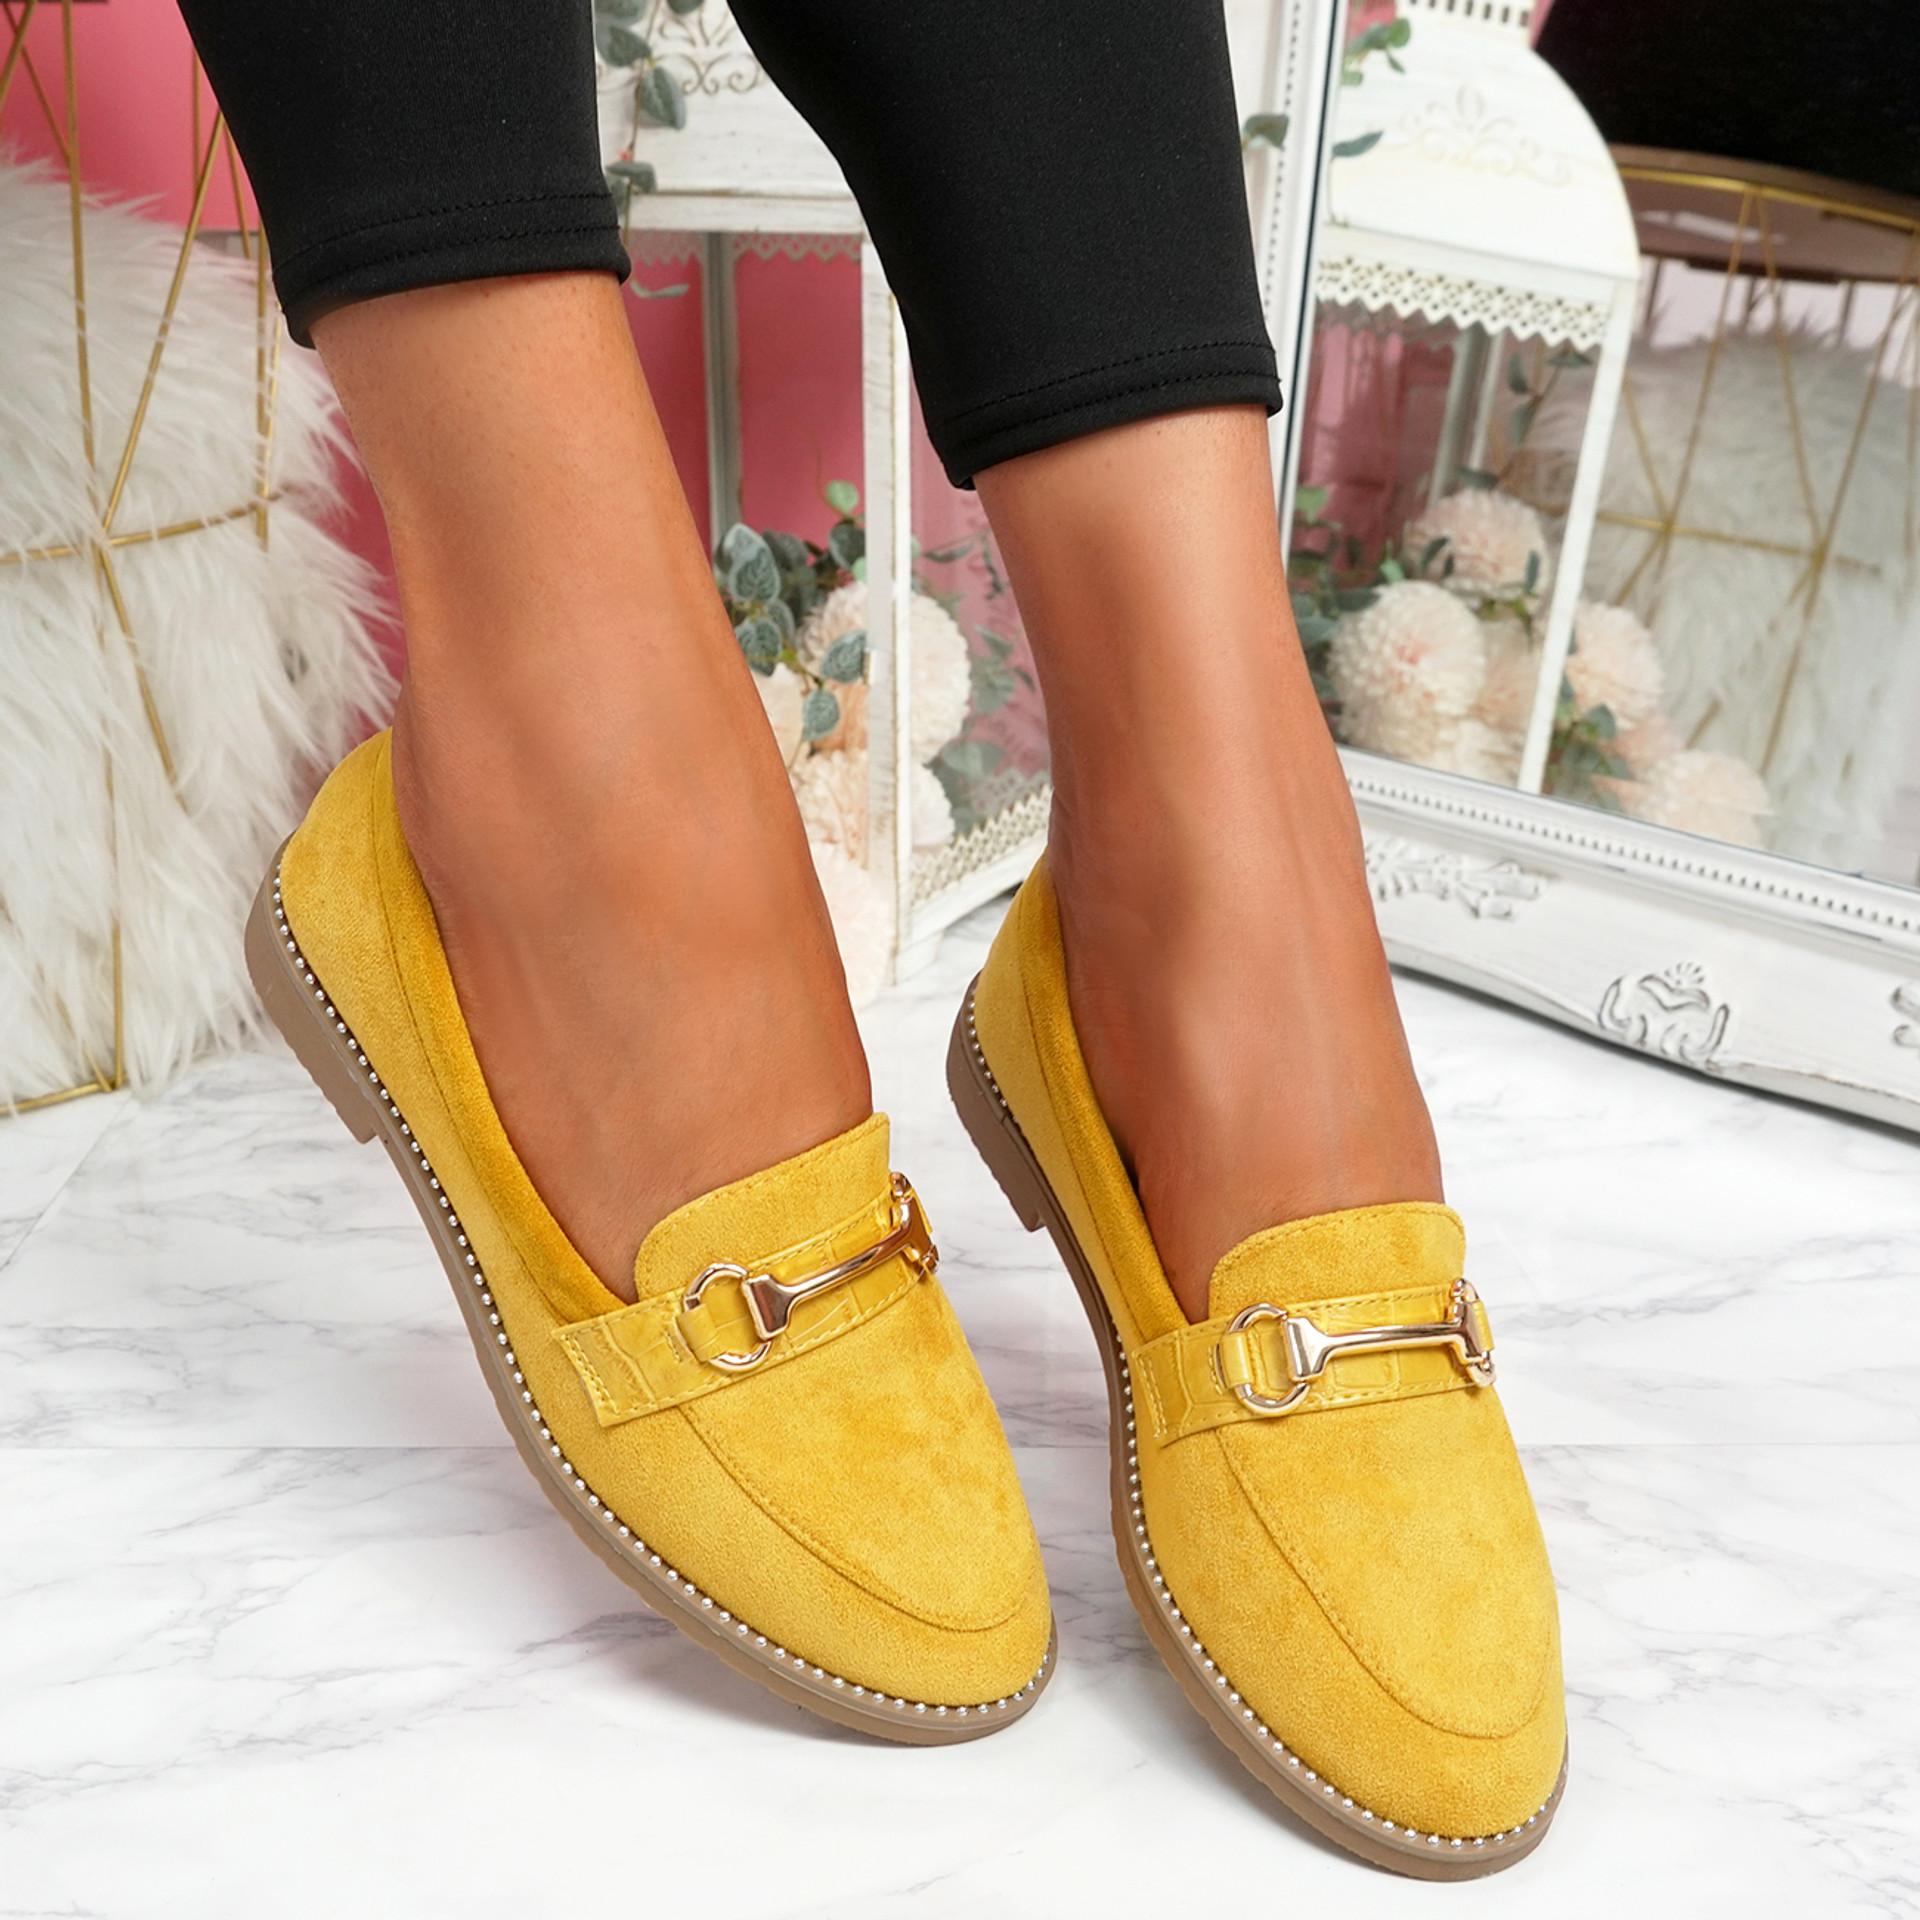 Sise Yellow Studded Ballerinas